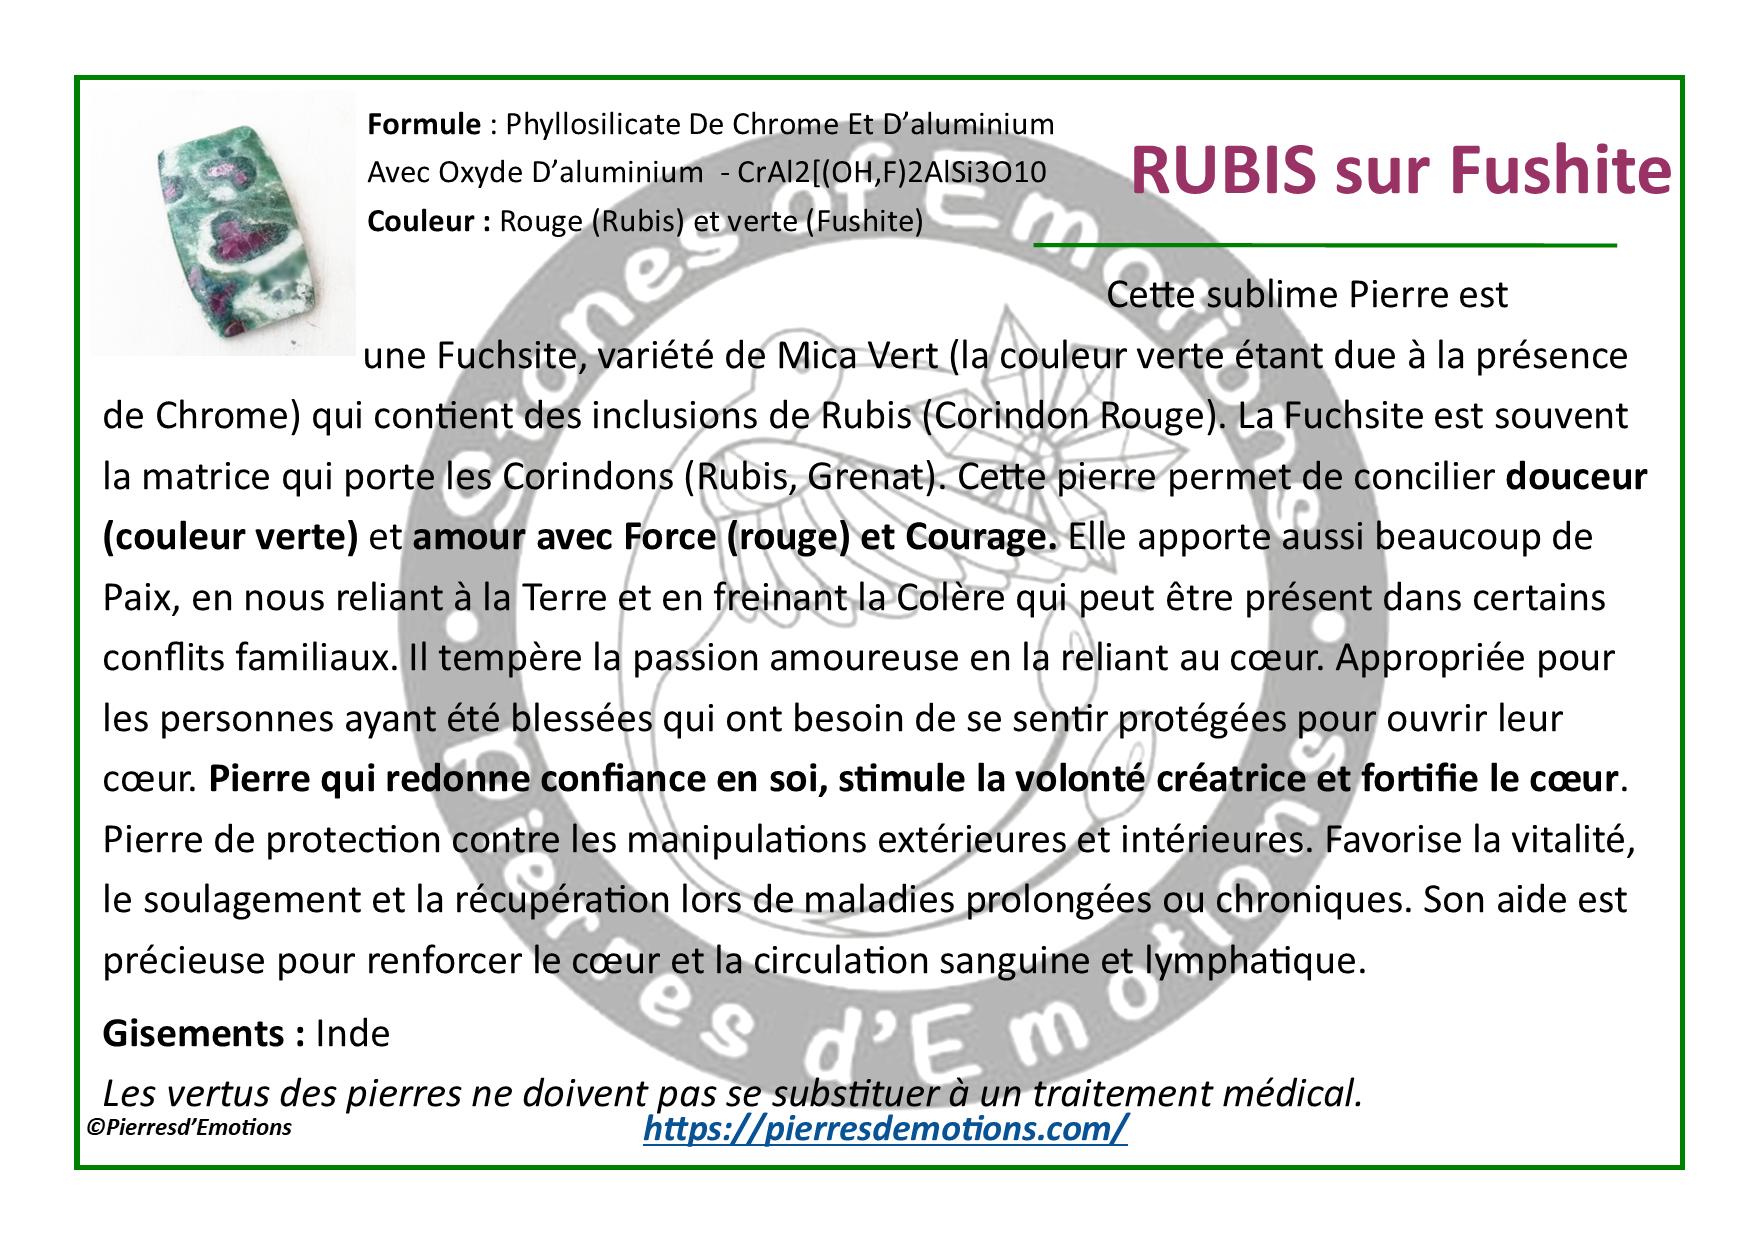 RubisFushite